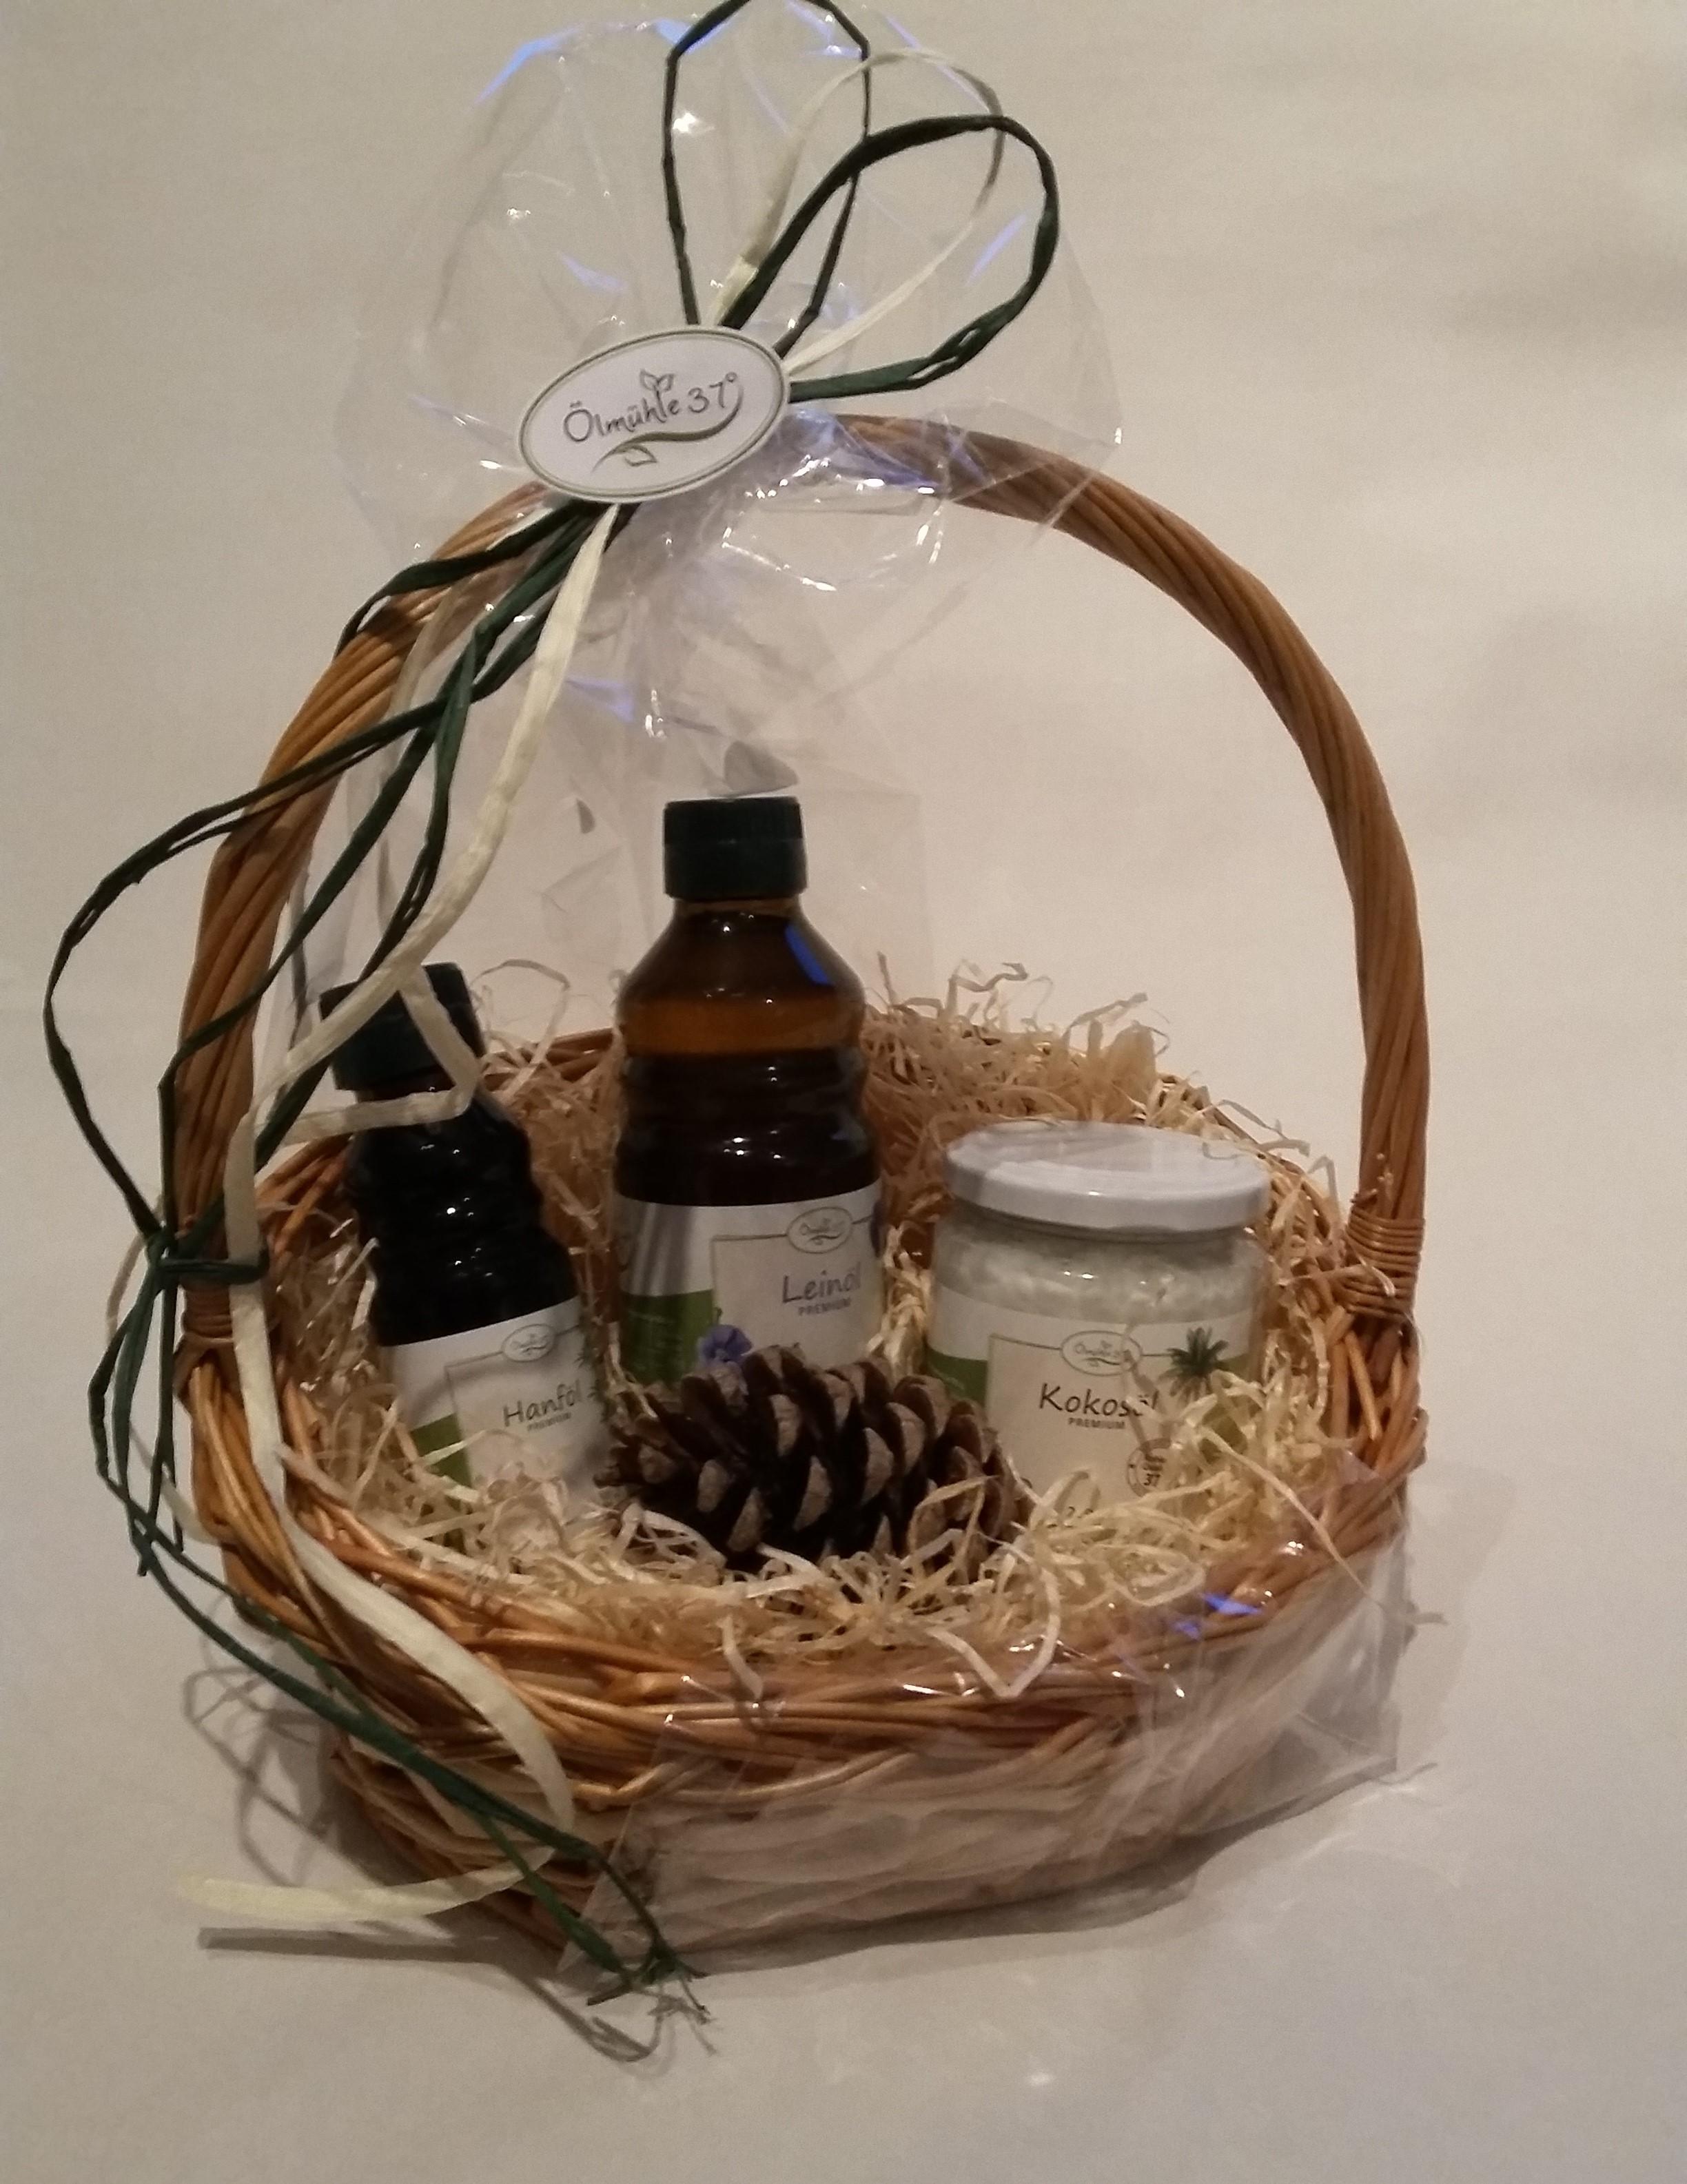 Geschenkpaket Öle (Leinöl 250ml / Hanföl 100ml / Kokosöl 250ml)